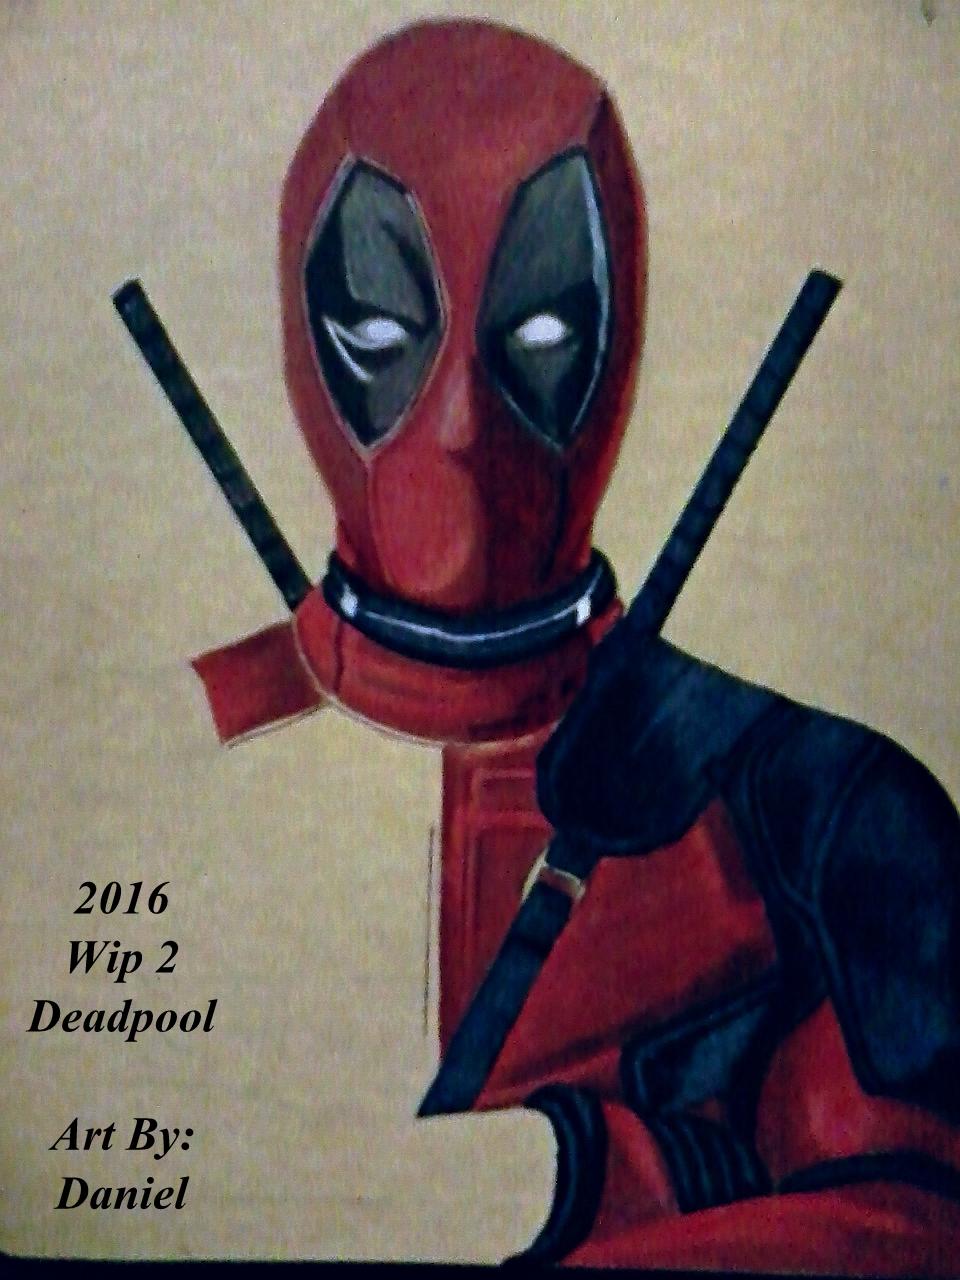 Deadpool (Wip 2) by nielopena